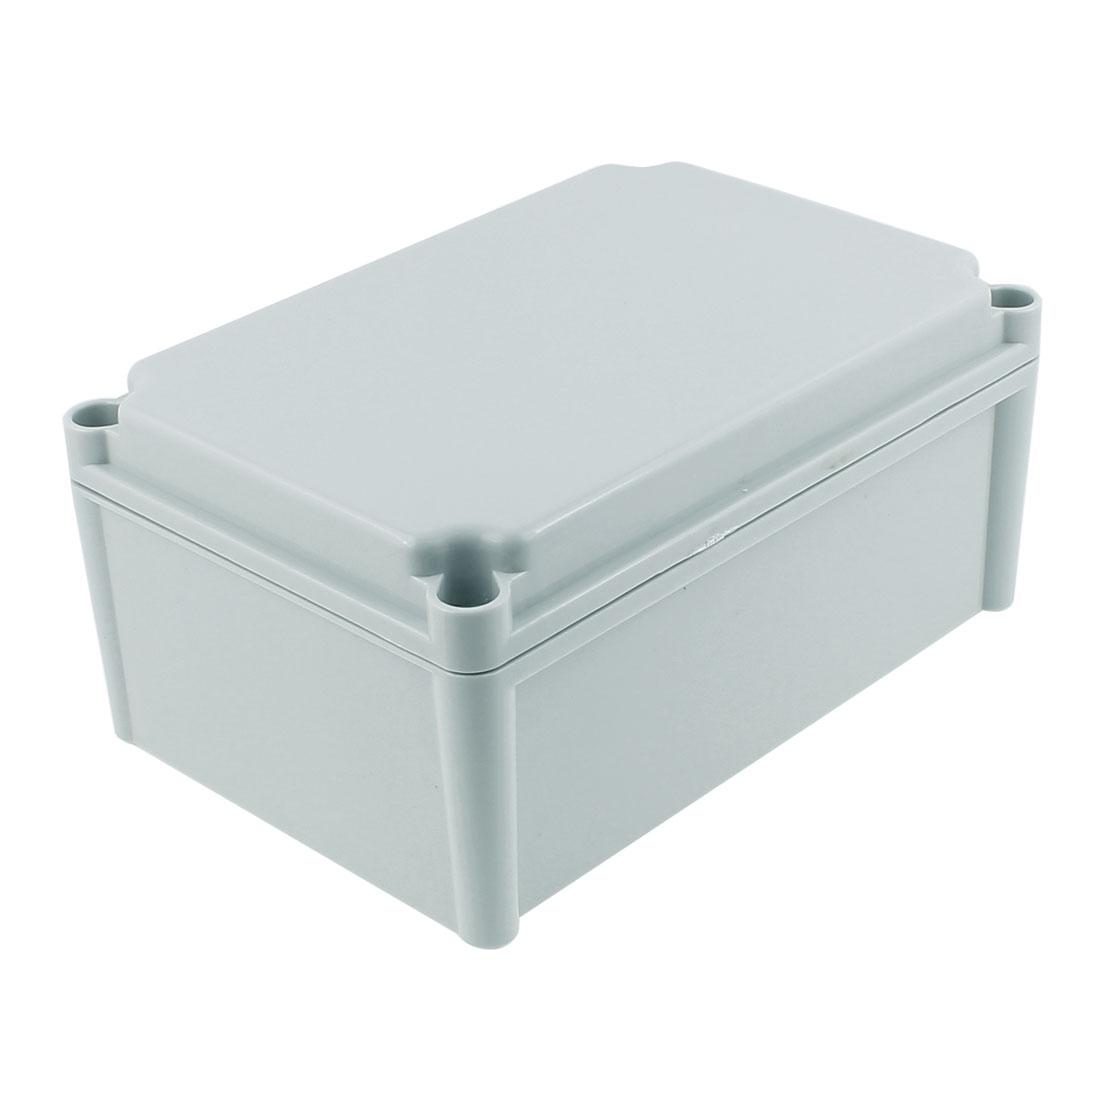 280x190x130mm Dustproof IP65 Junction Box DIY Terminal Connection Enclosure